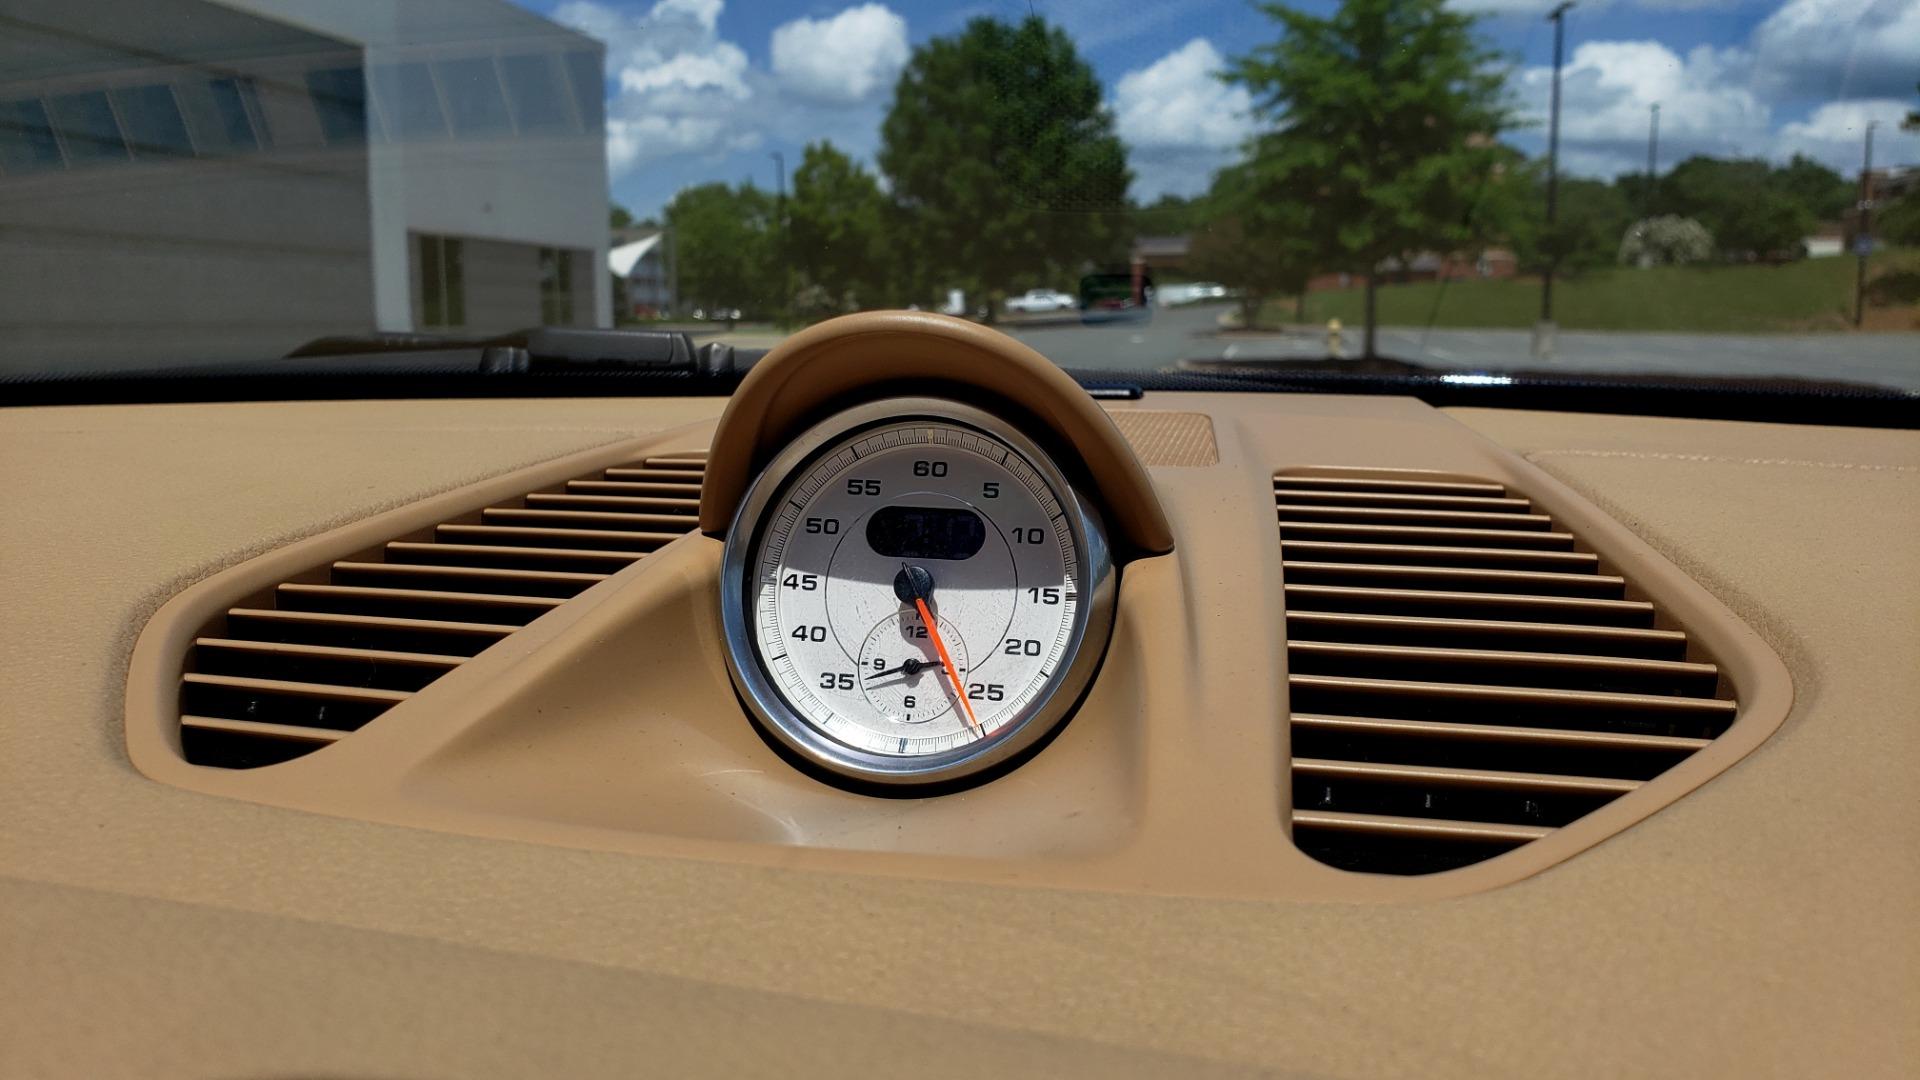 Used 2014 Porsche 911 CARRERA S CABRIOLET / PREM PKG / PDK / NAV / BOSE / SPORT CHRONO for sale $81,995 at Formula Imports in Charlotte NC 28227 41